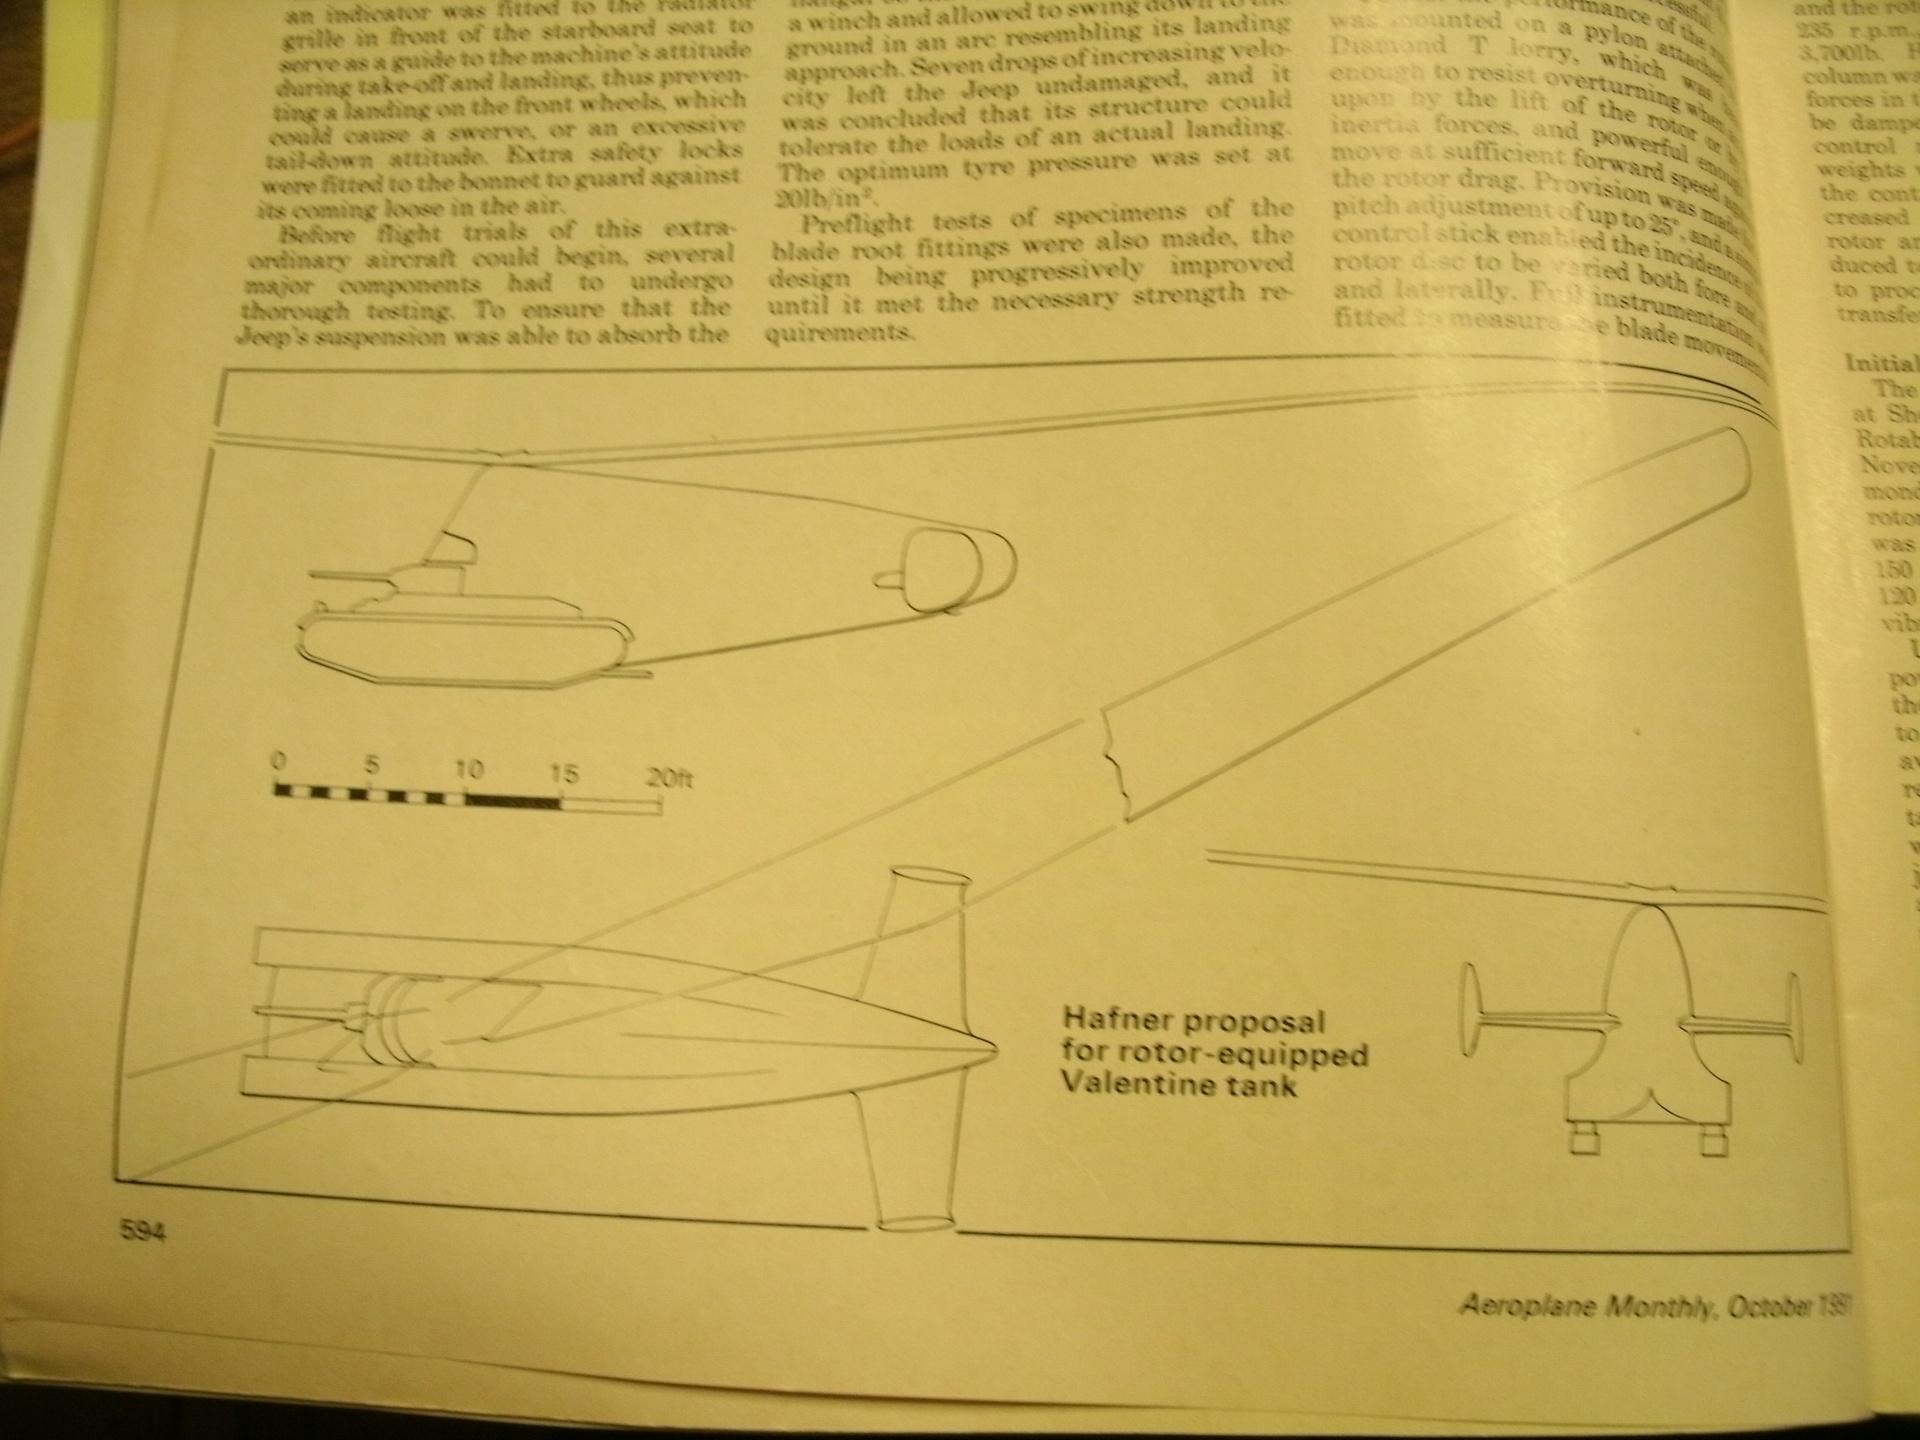 AERPLANE MONTHLY」1991年10月号 よりその2.JPG